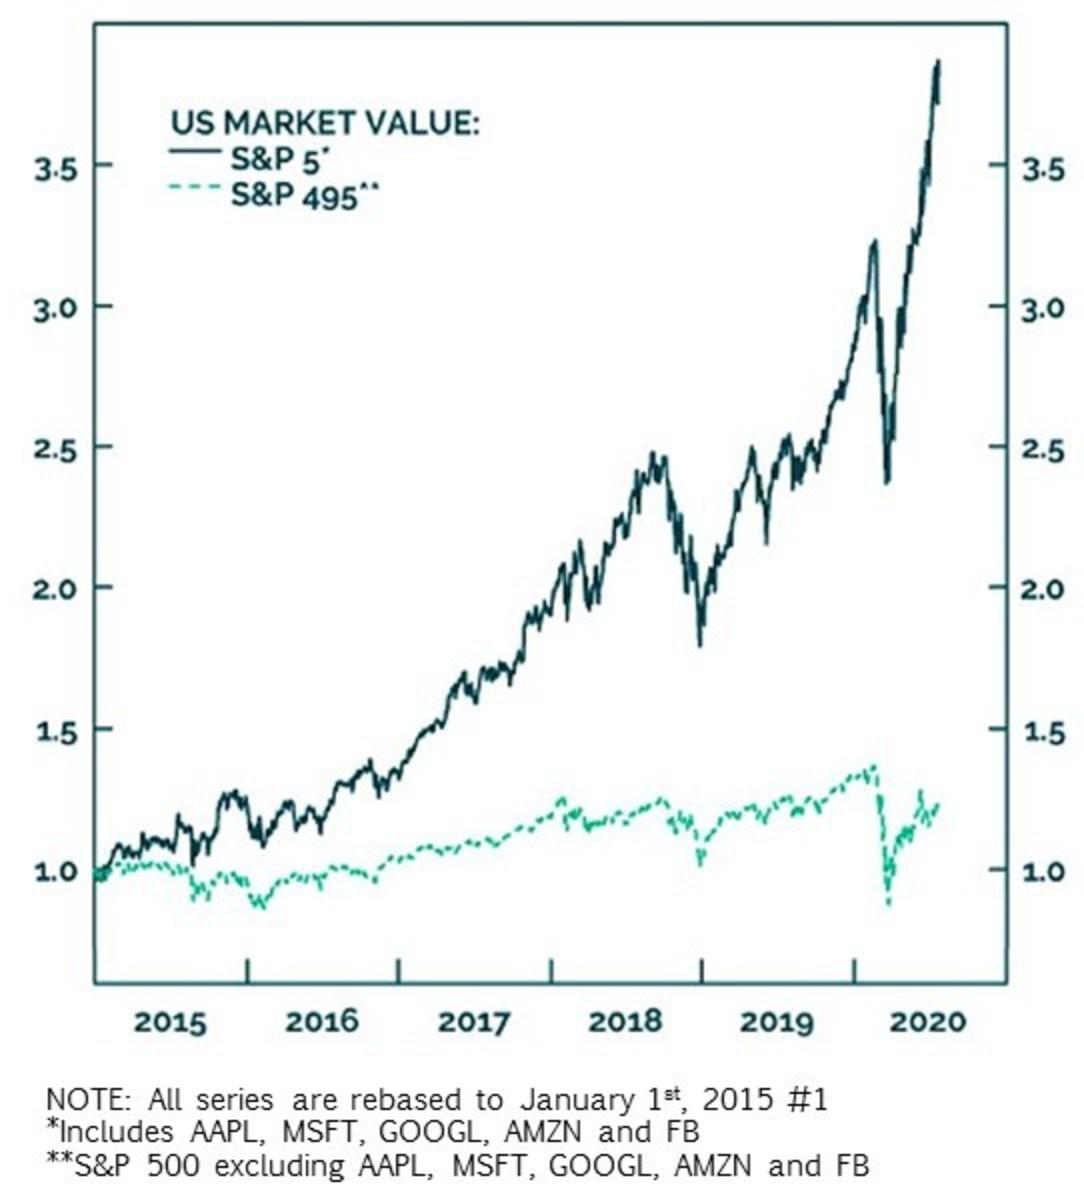 Top 5 market performers in S&P500